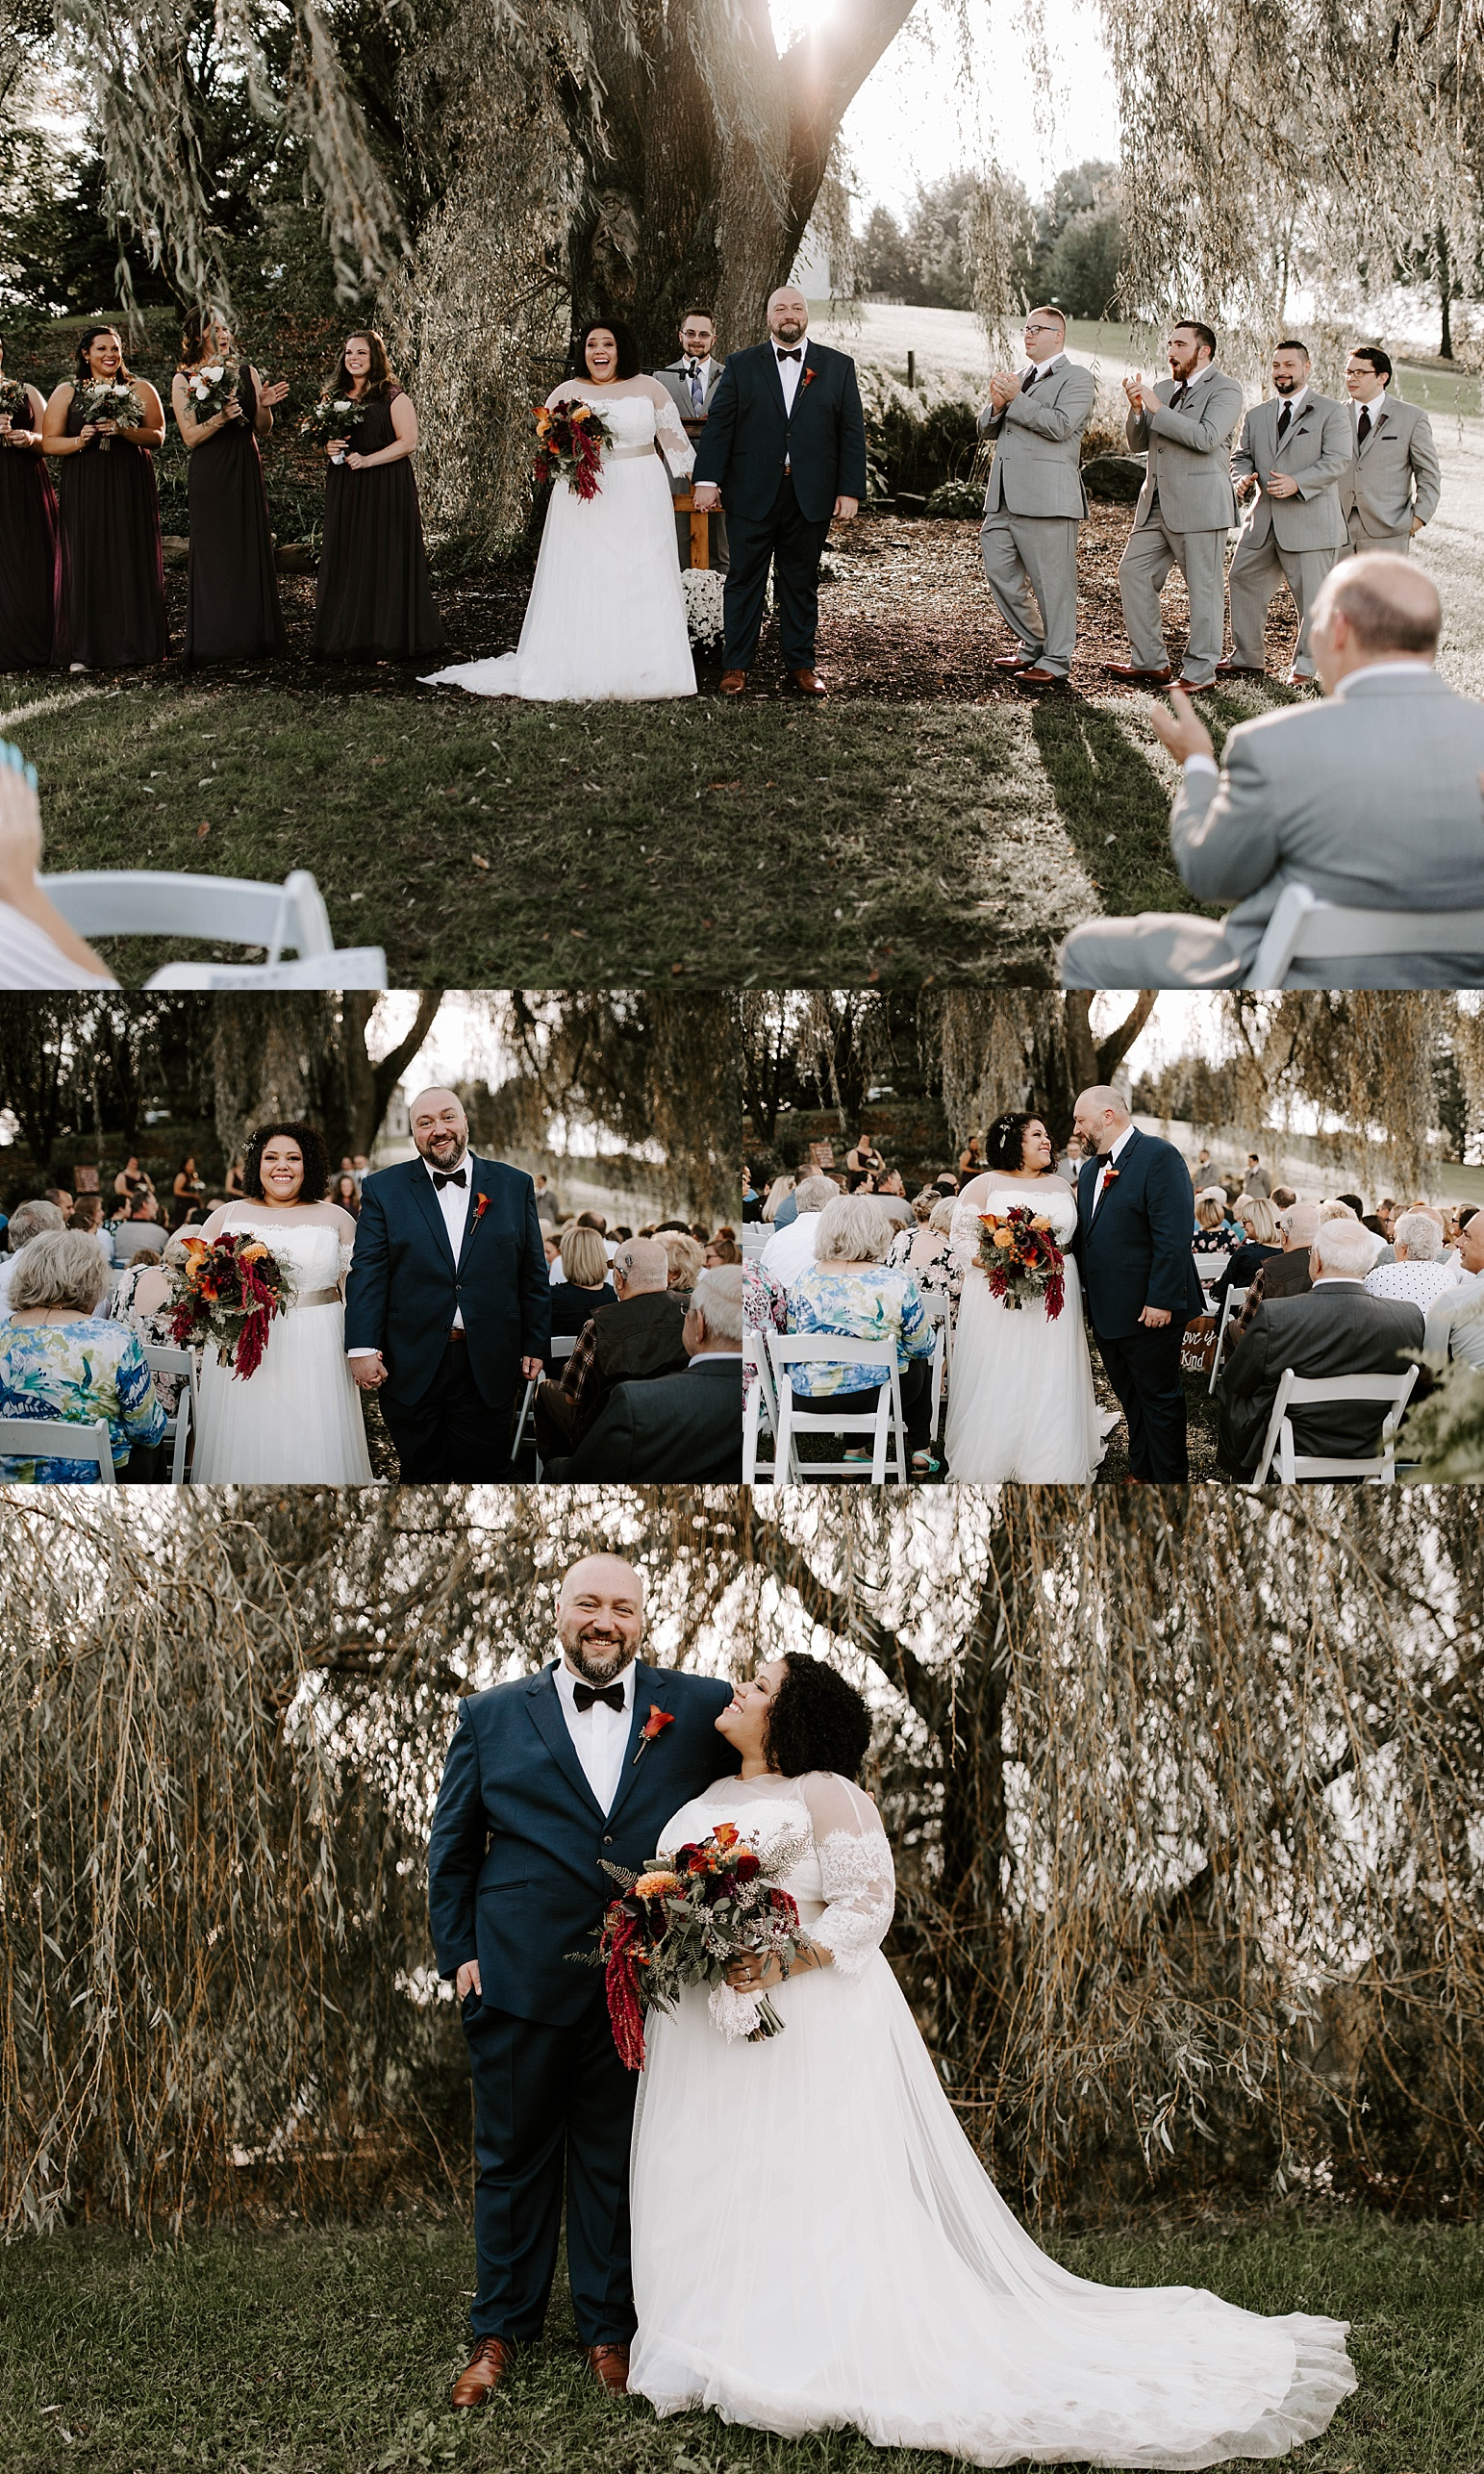 ashley_sara_photography_pittsburgh-wedding-photographer_ohio-wedding-photographer_destination-wedding-photographer9.jpg